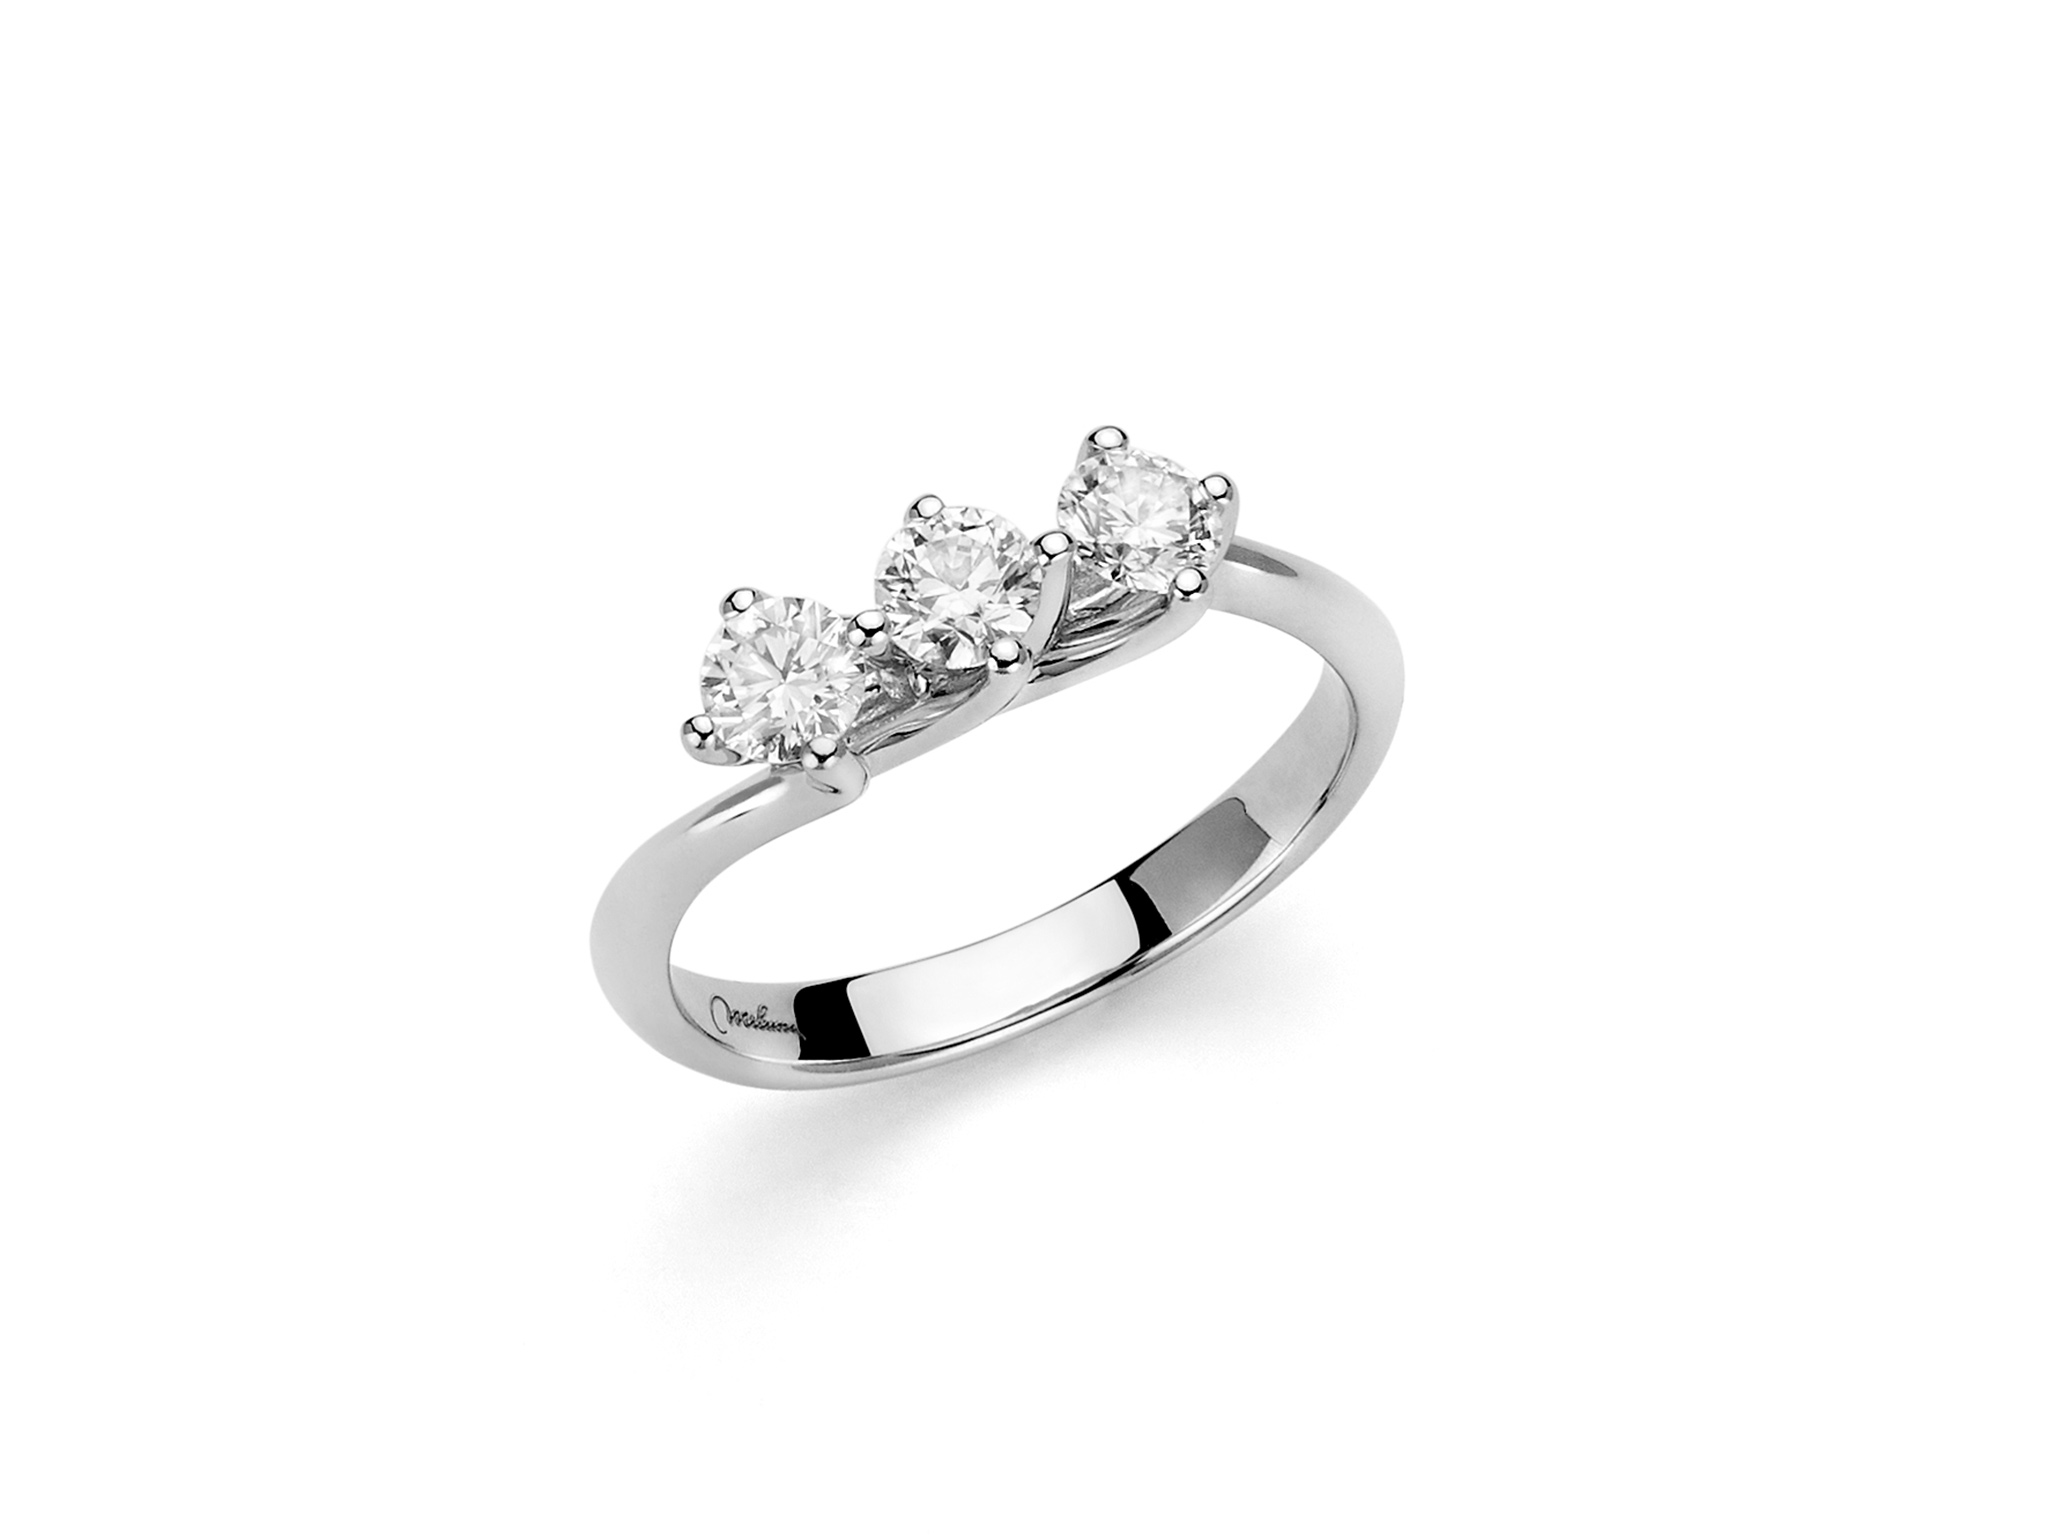 Anello trilogy con diamanti - LID3312-039G7